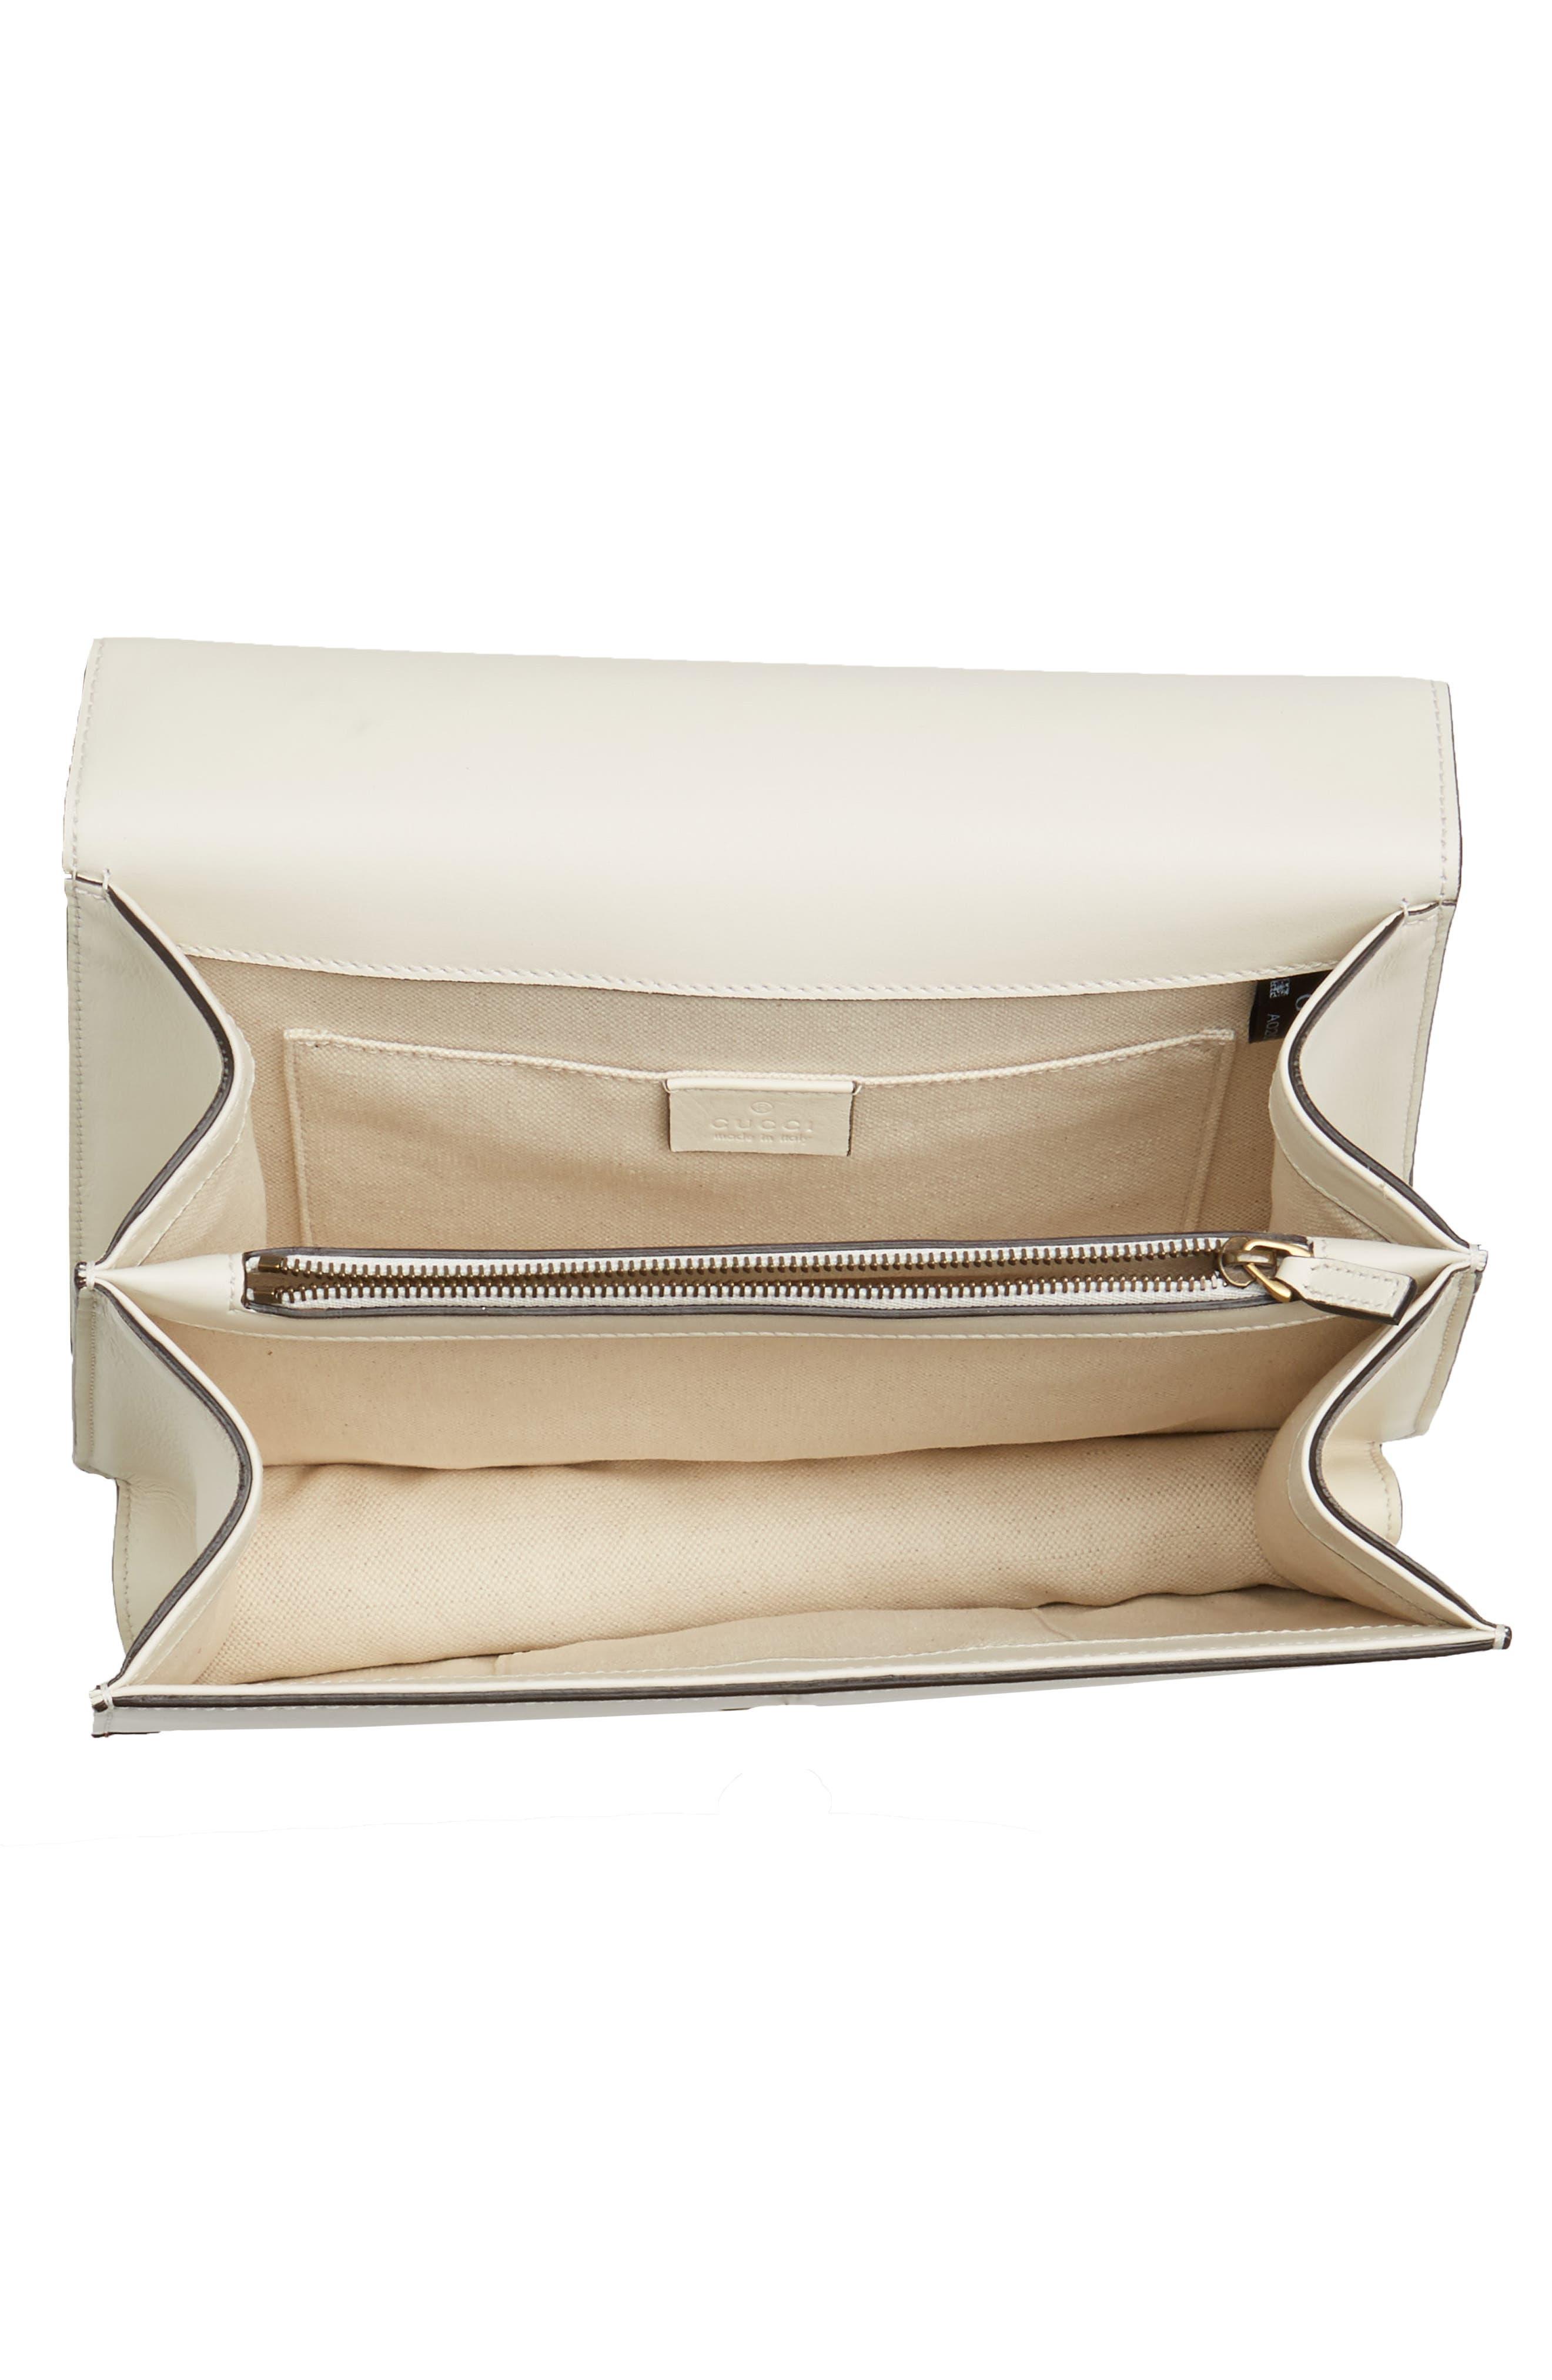 Alternate Image 3  - Gucci Small Dionysus Top Handle Leather Shoulder Bag